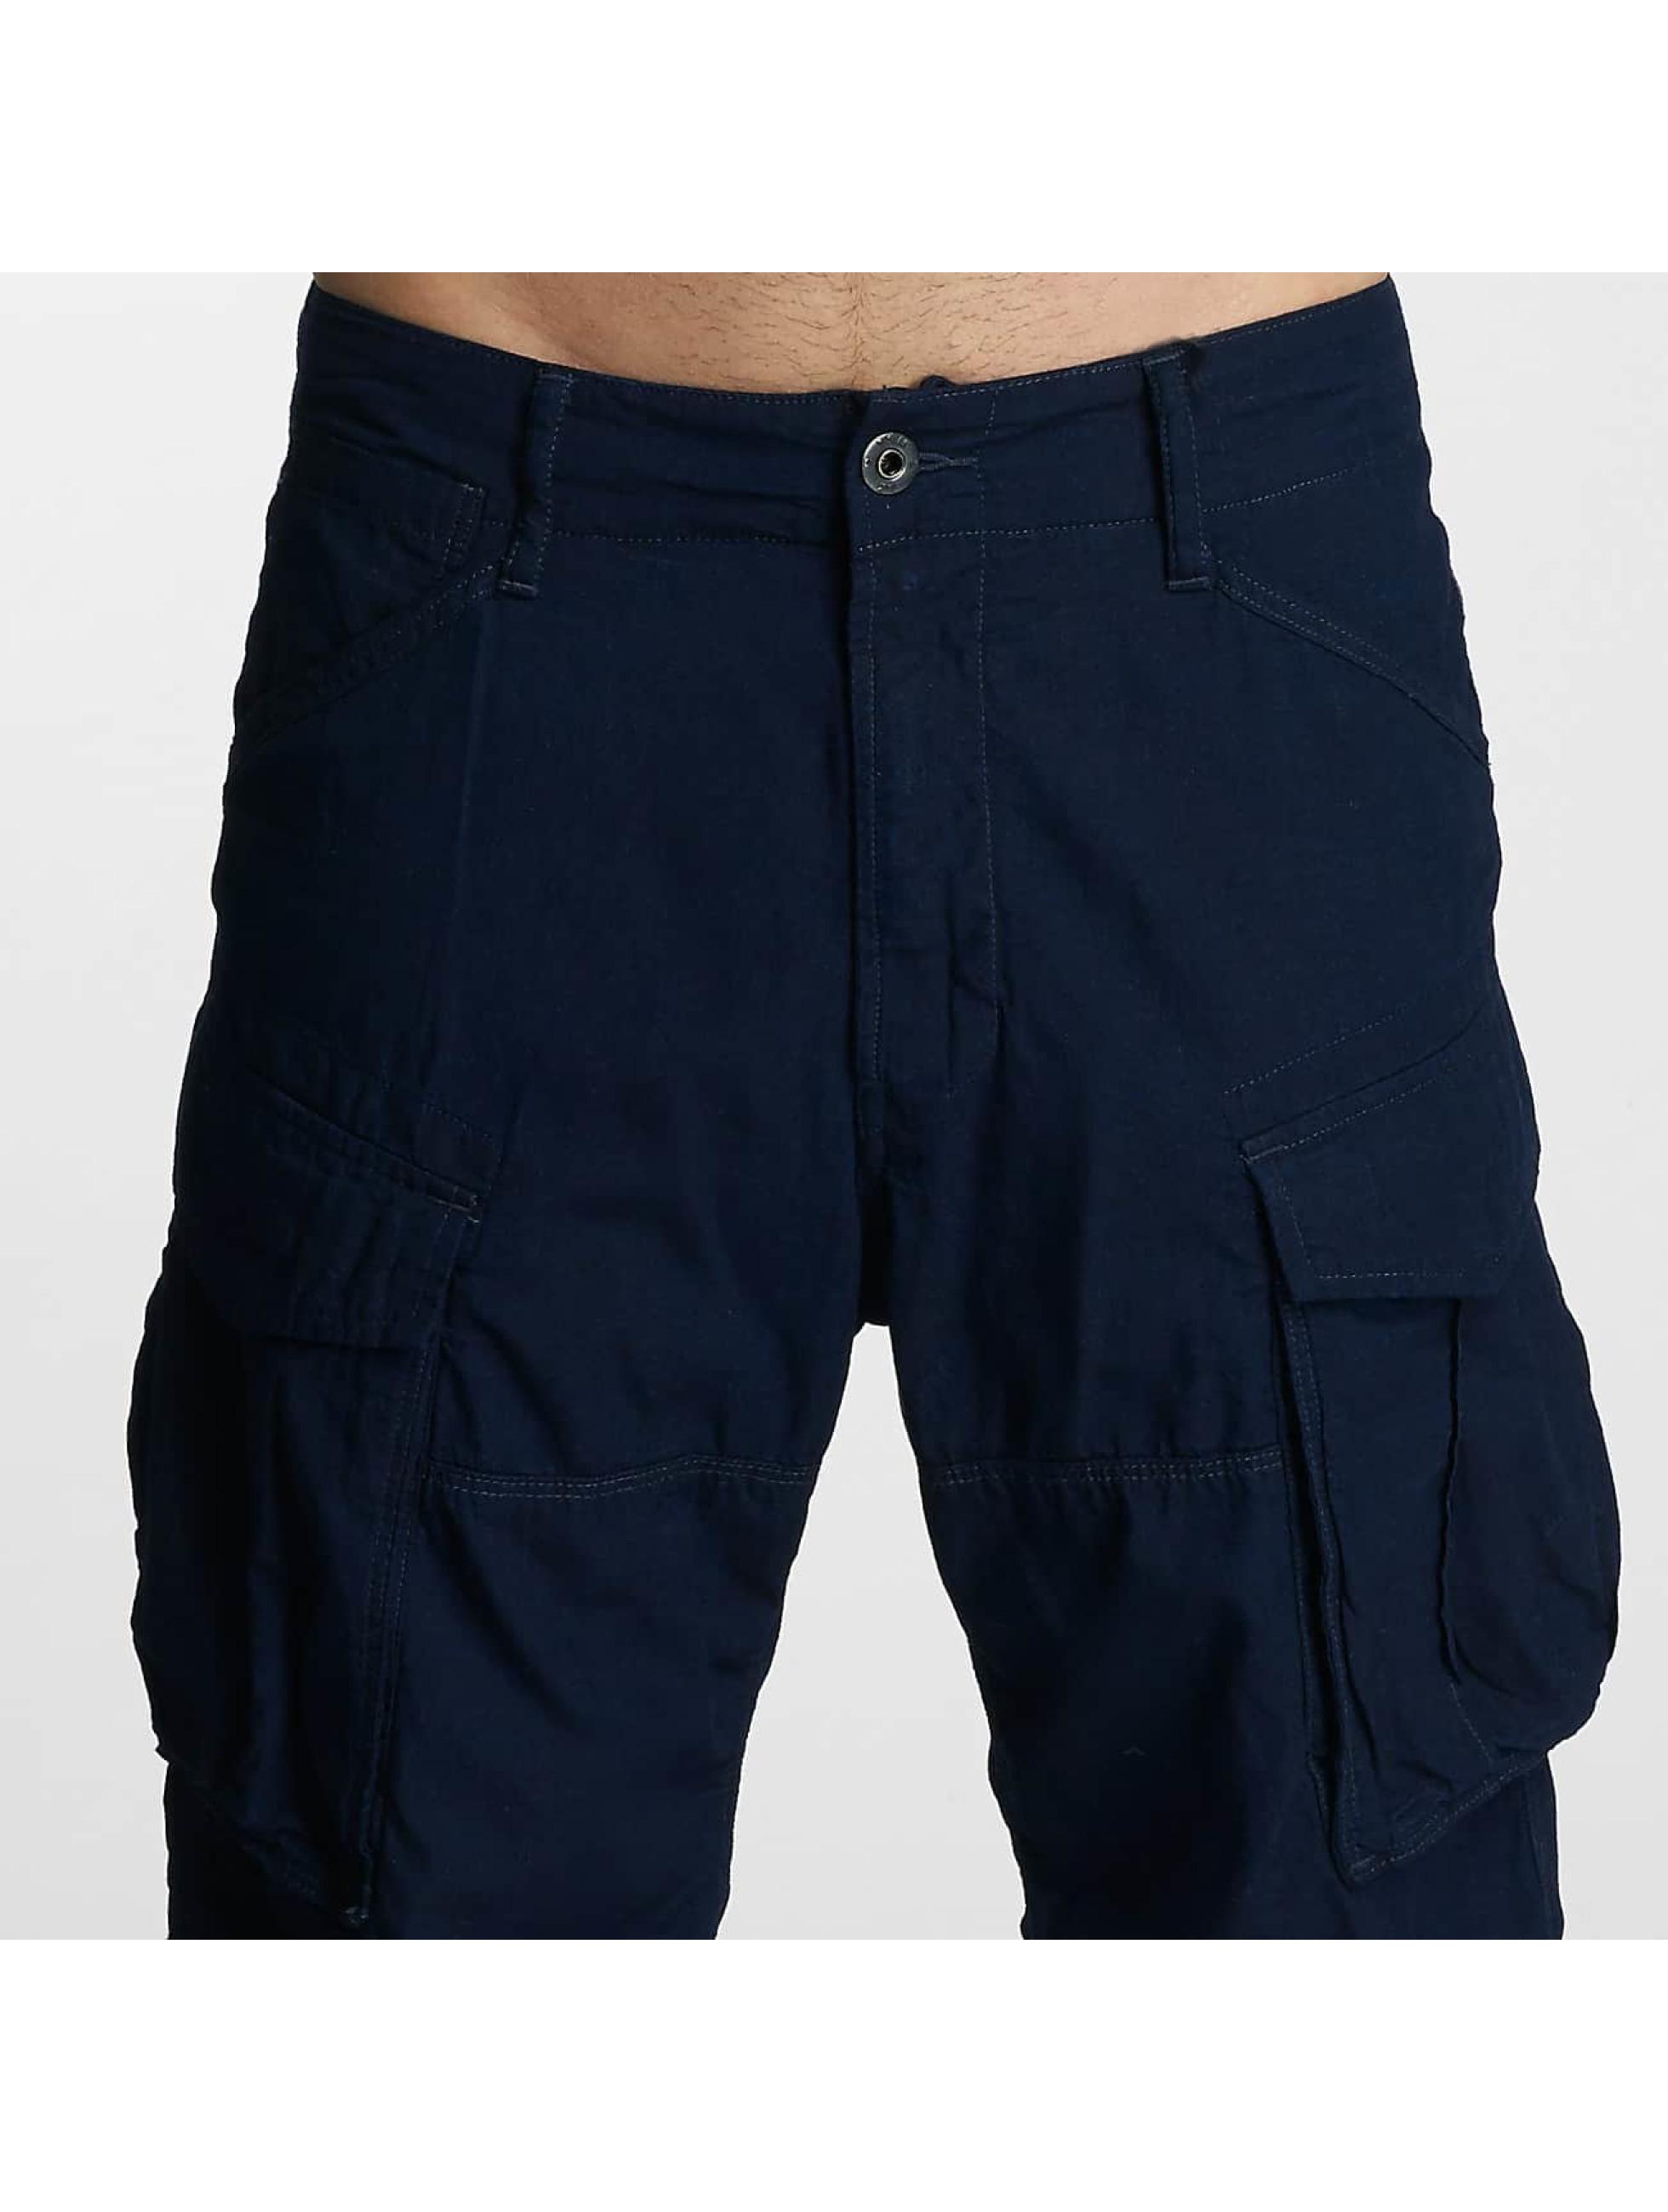 G-Star Short Rovic Loose 1/2 Niss Chambray blue